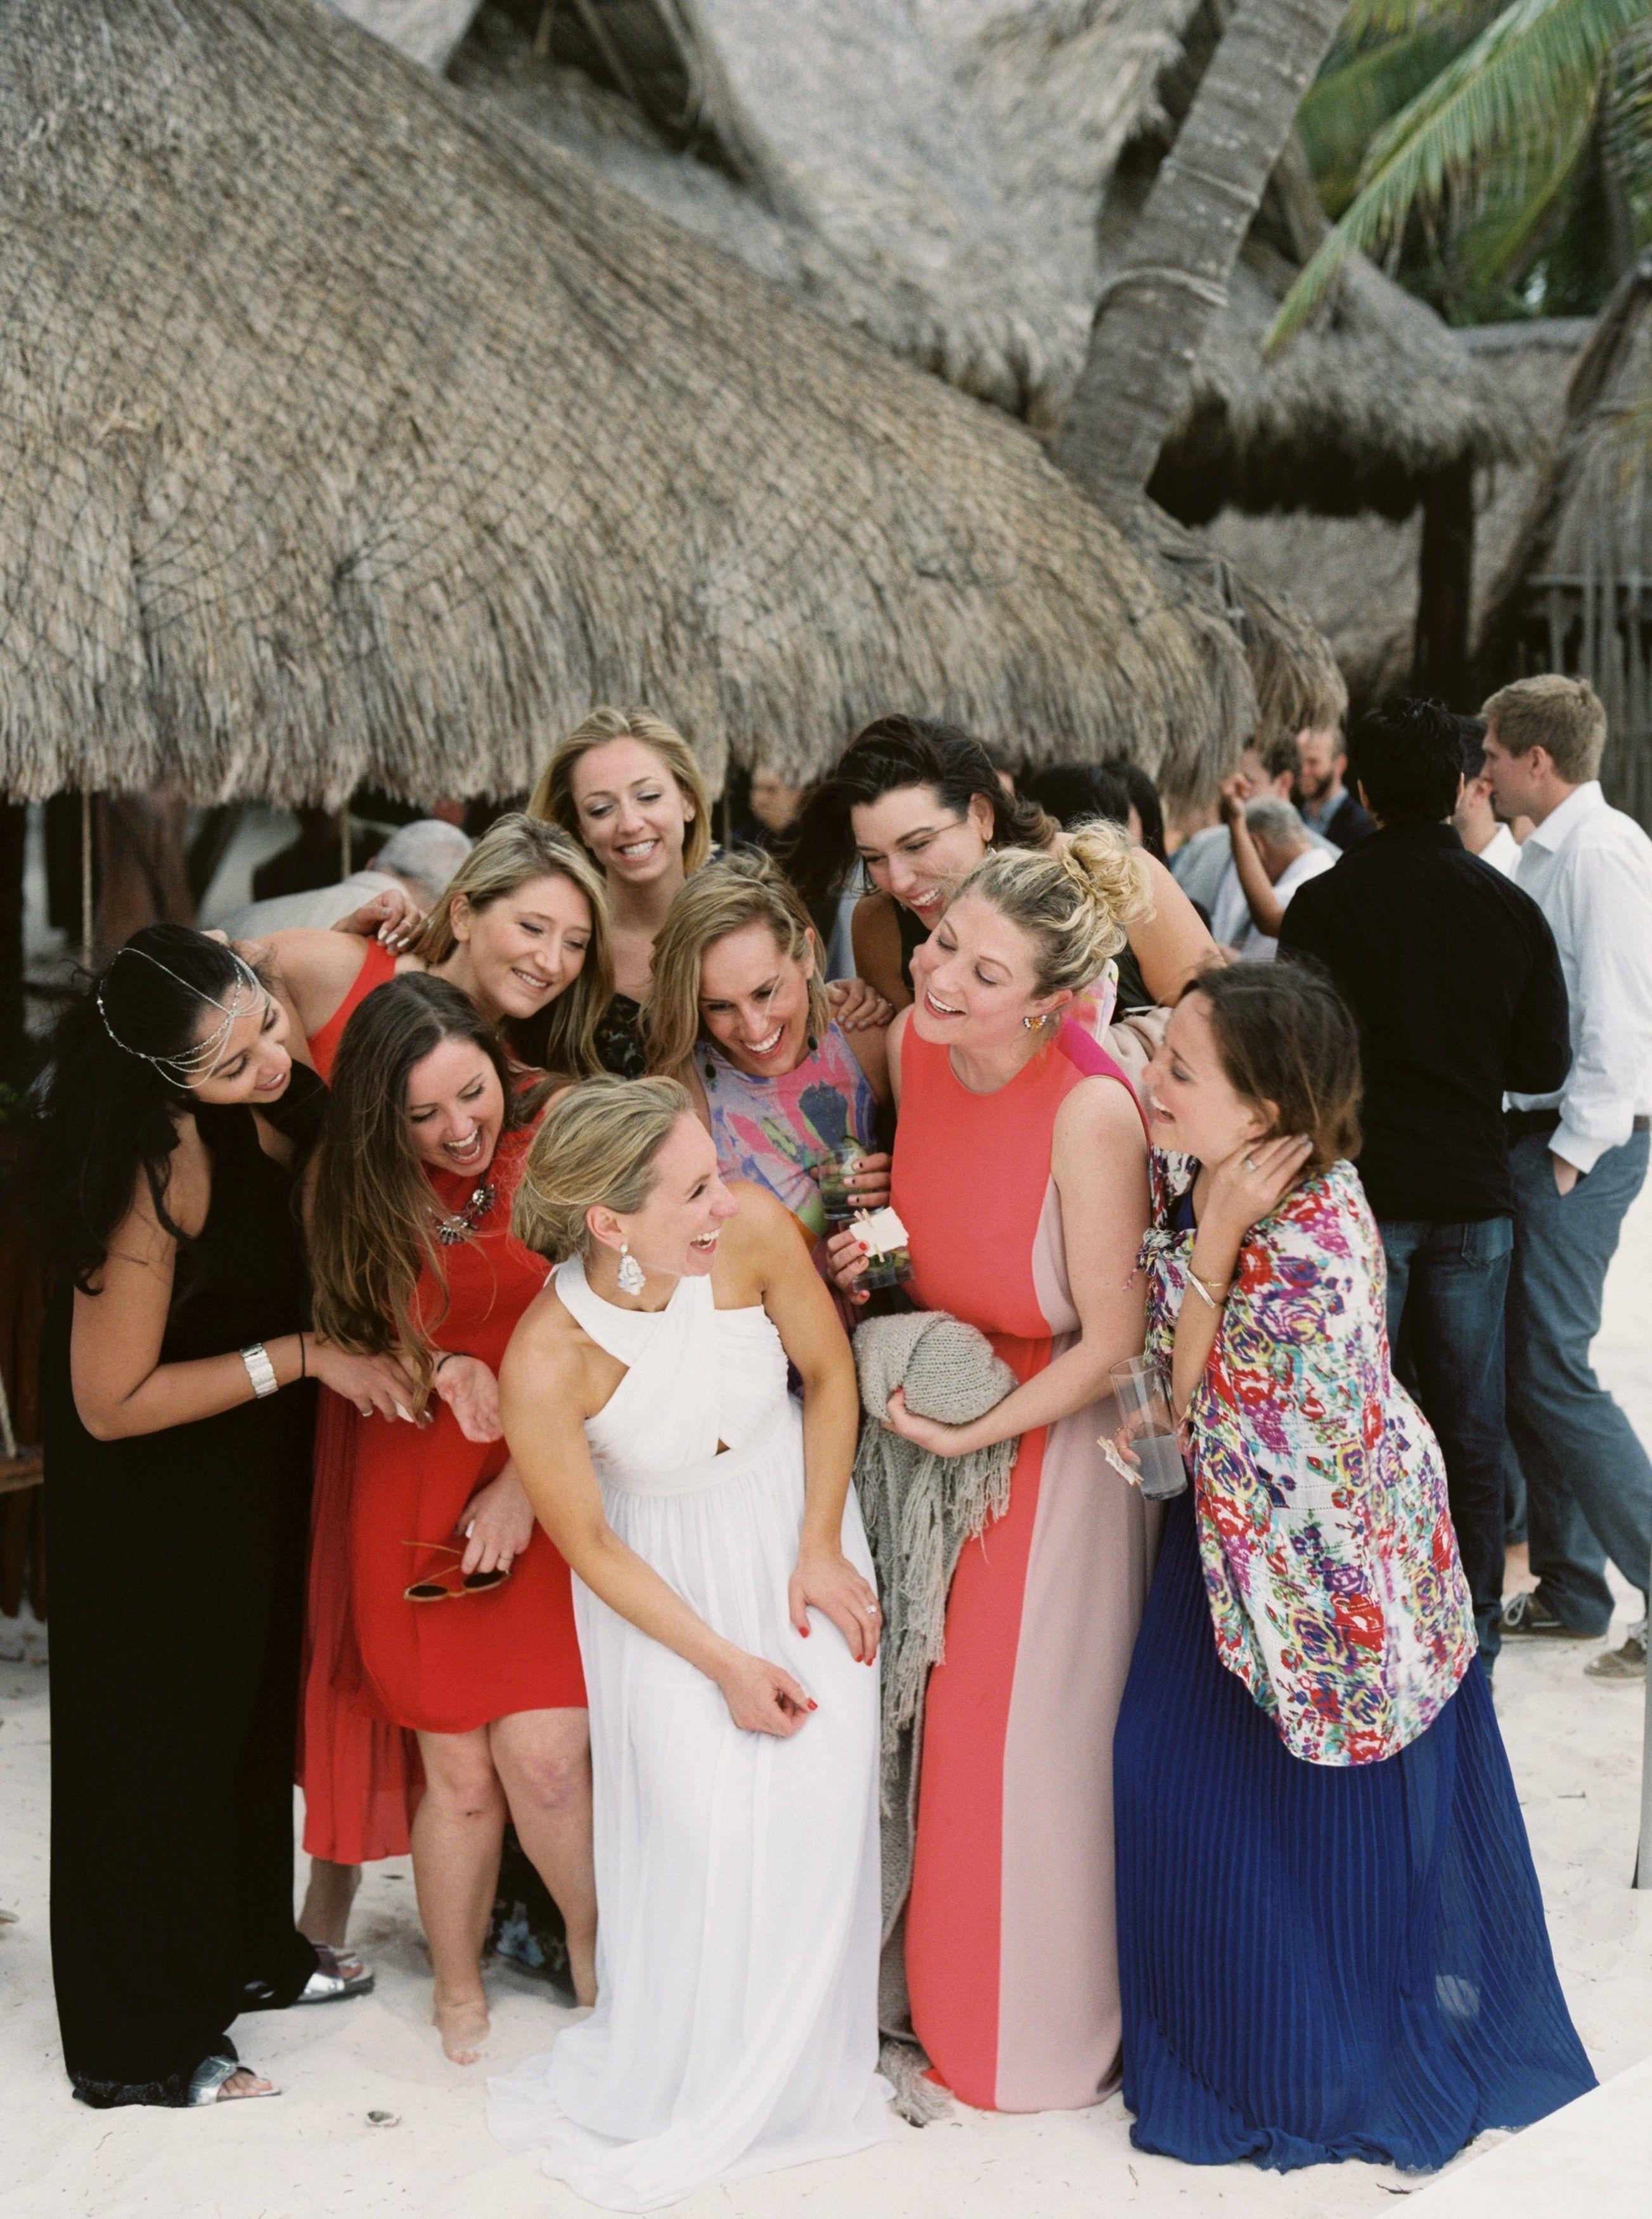 Every Wedding Guest Dress Code Explained Spring Wedding Guest Dress Formal Wedding Attire Wedding Guest Dress [ 3500 x 2606 Pixel ]